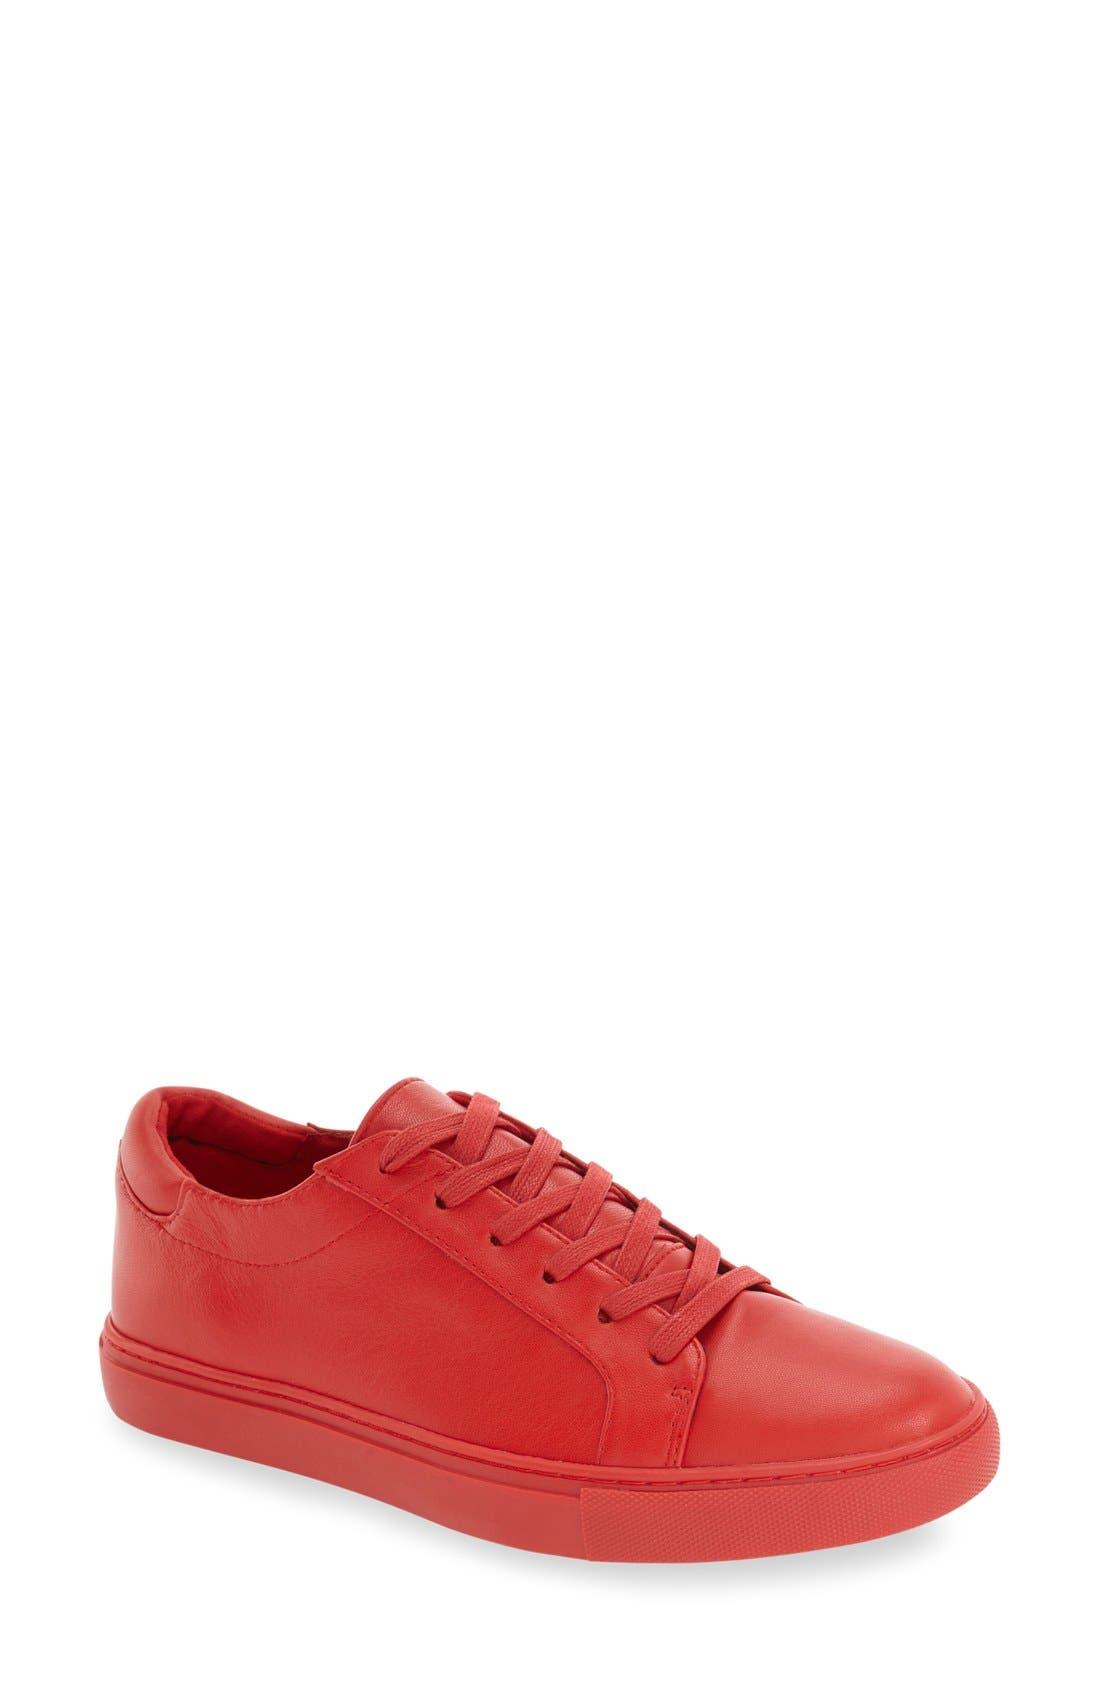 Alternate Image 1 Selected - Kenneth Cole New York 'Kam' Sneaker (Women)